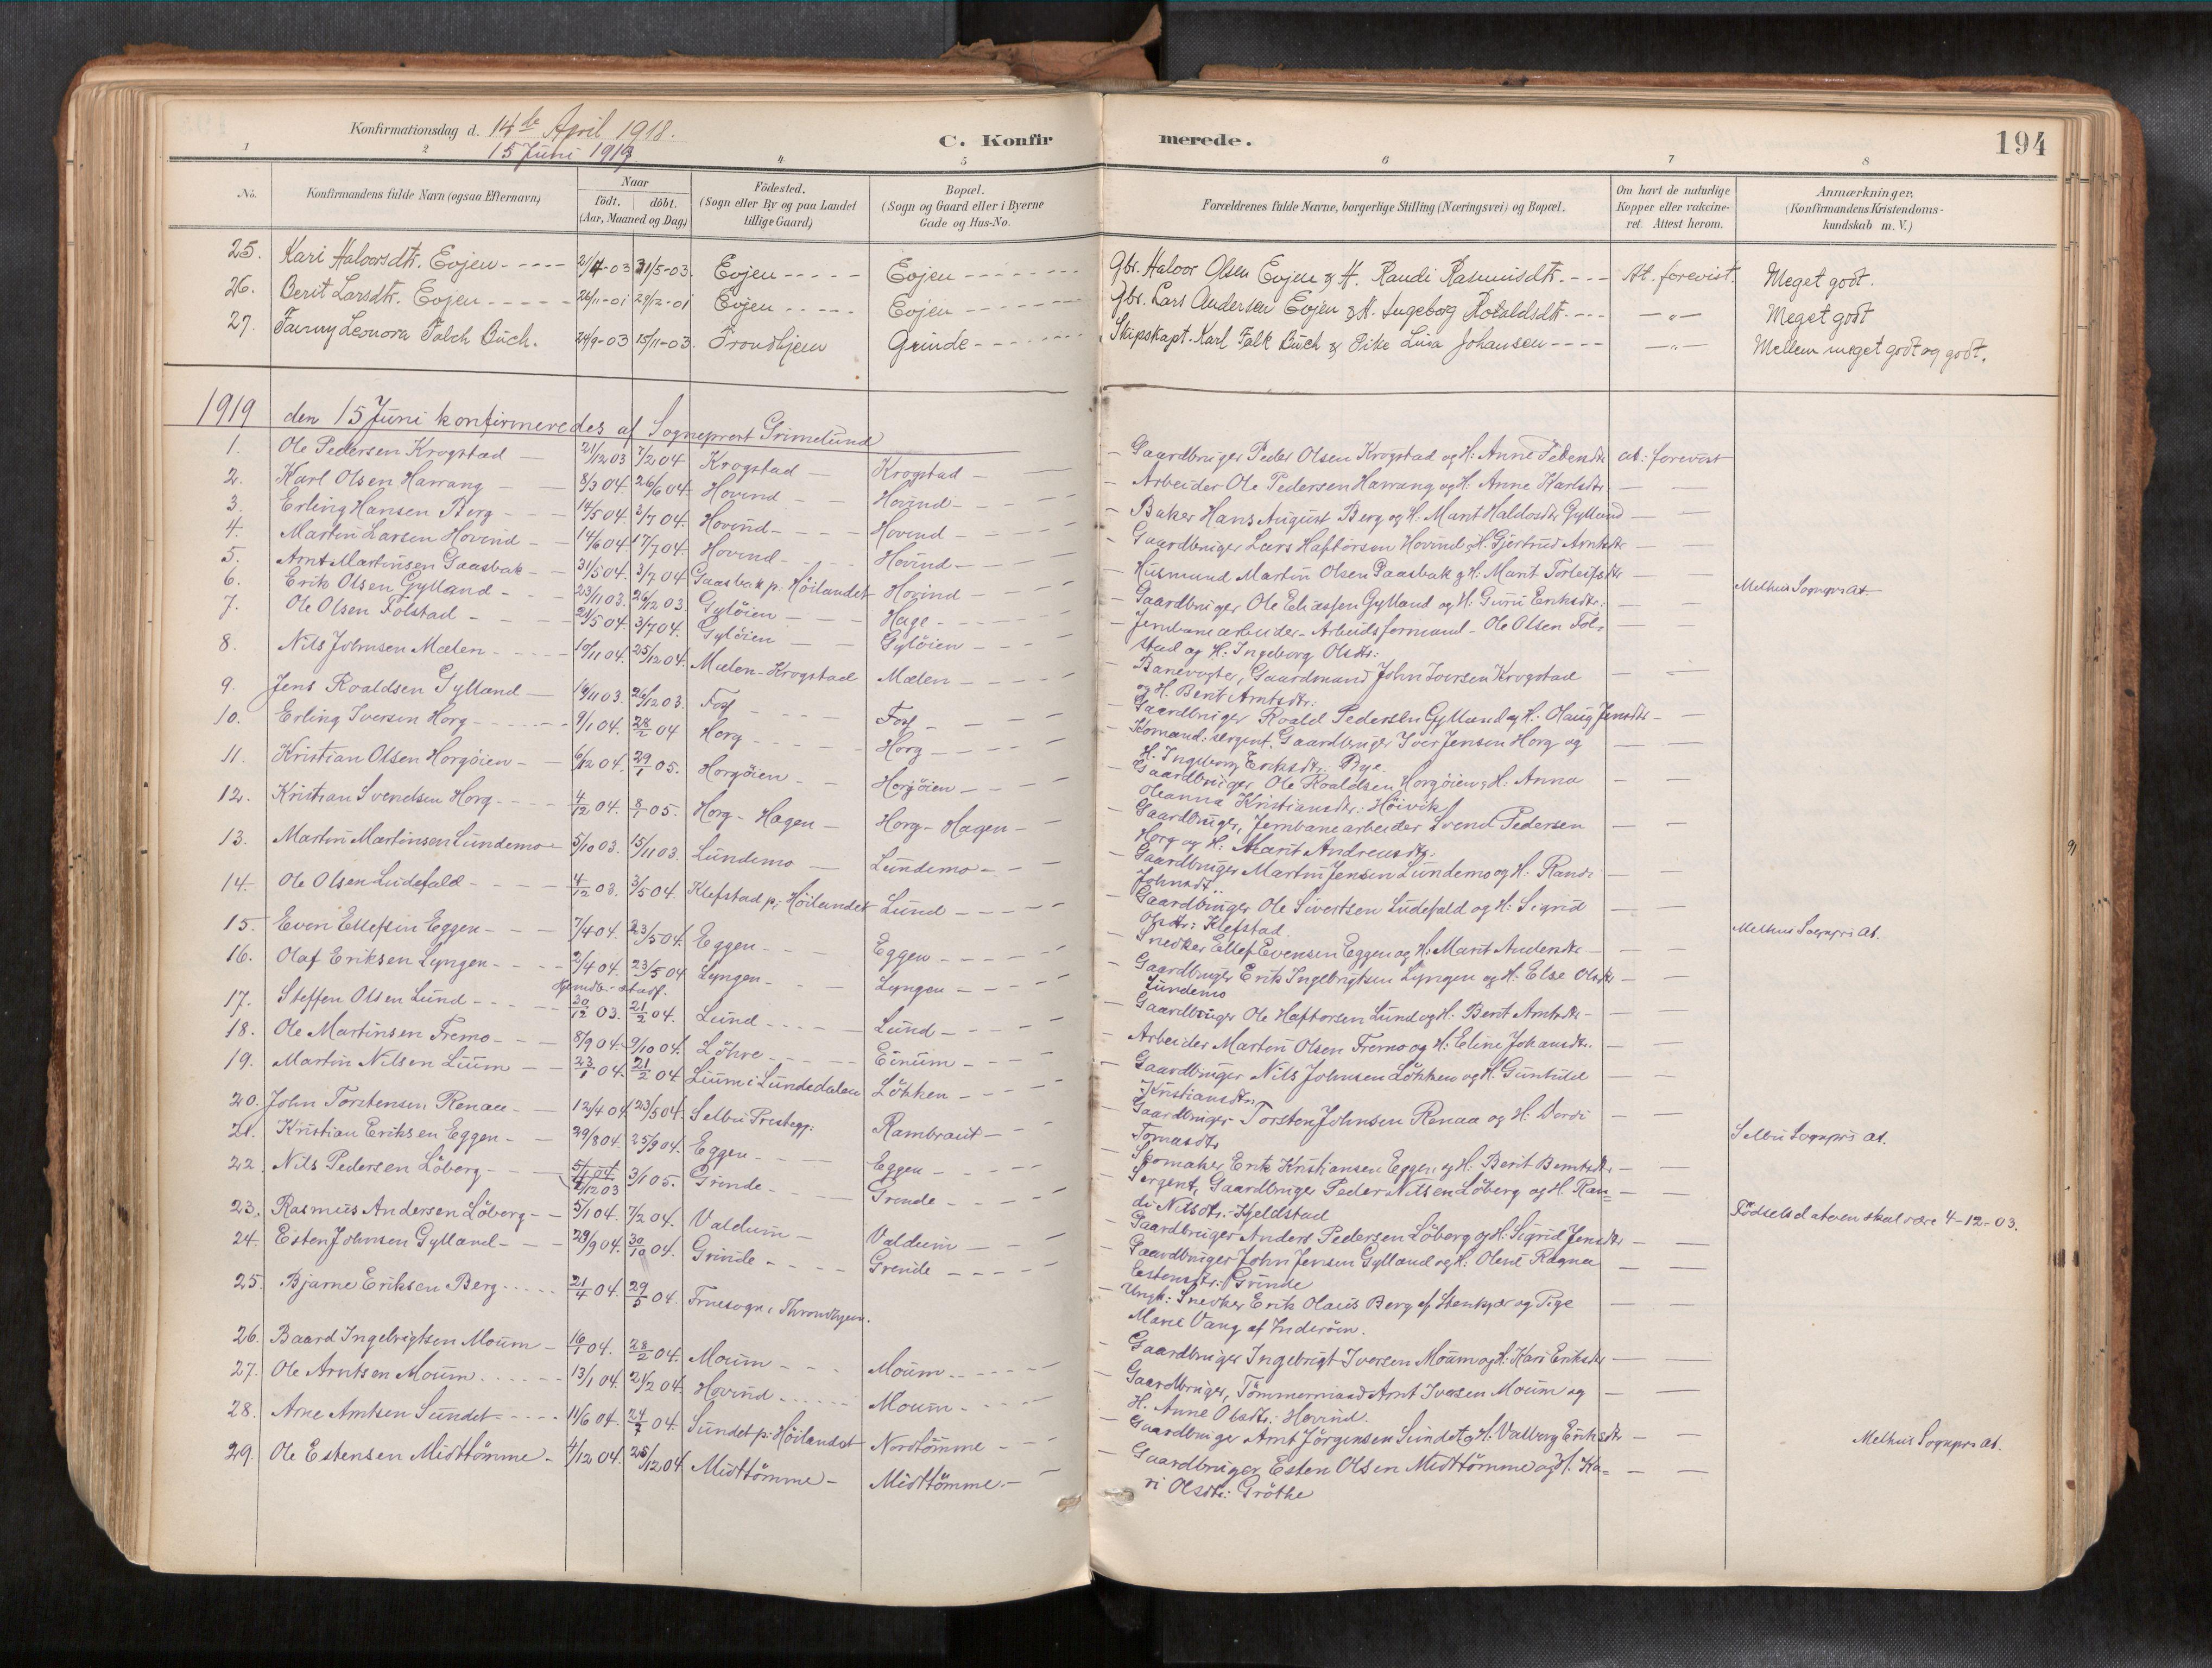 SAT, Ministerialprotokoller, klokkerbøker og fødselsregistre - Sør-Trøndelag, 692/L1105b: Parish register (official) no. 692A06, 1891-1934, p. 194